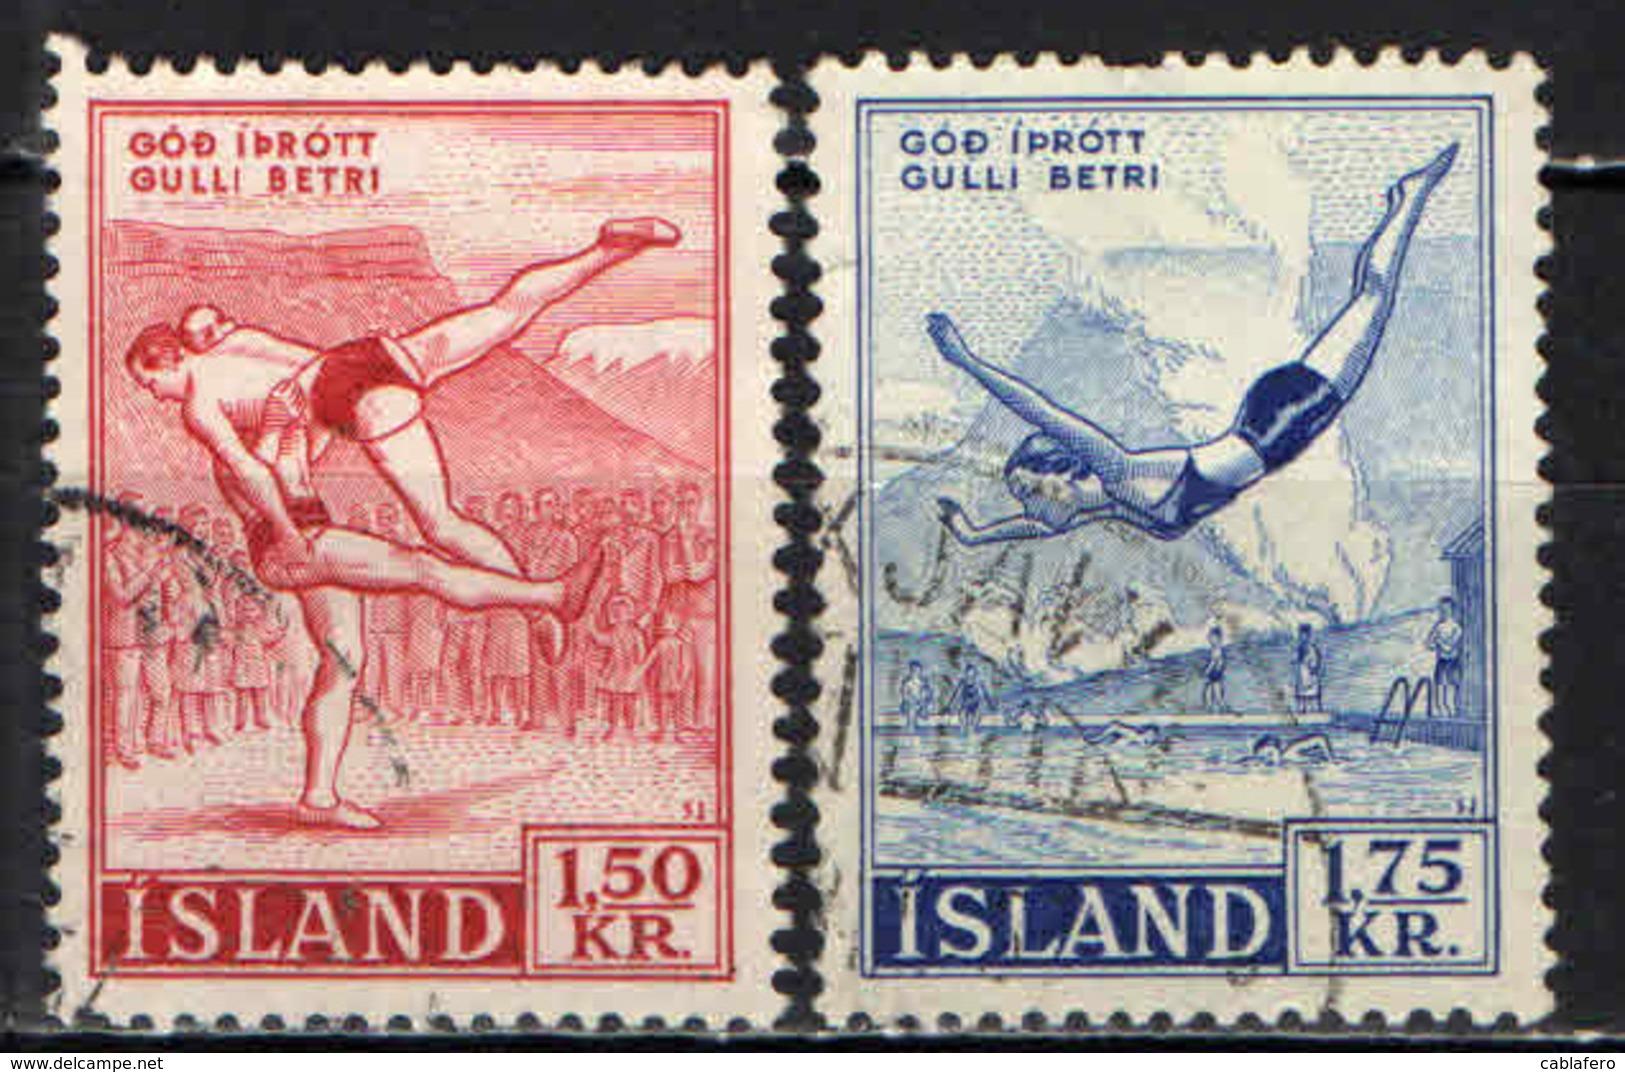 ISLANDA - 1957 - SPORT: LOTTA E TUFFI - USATI - Usati